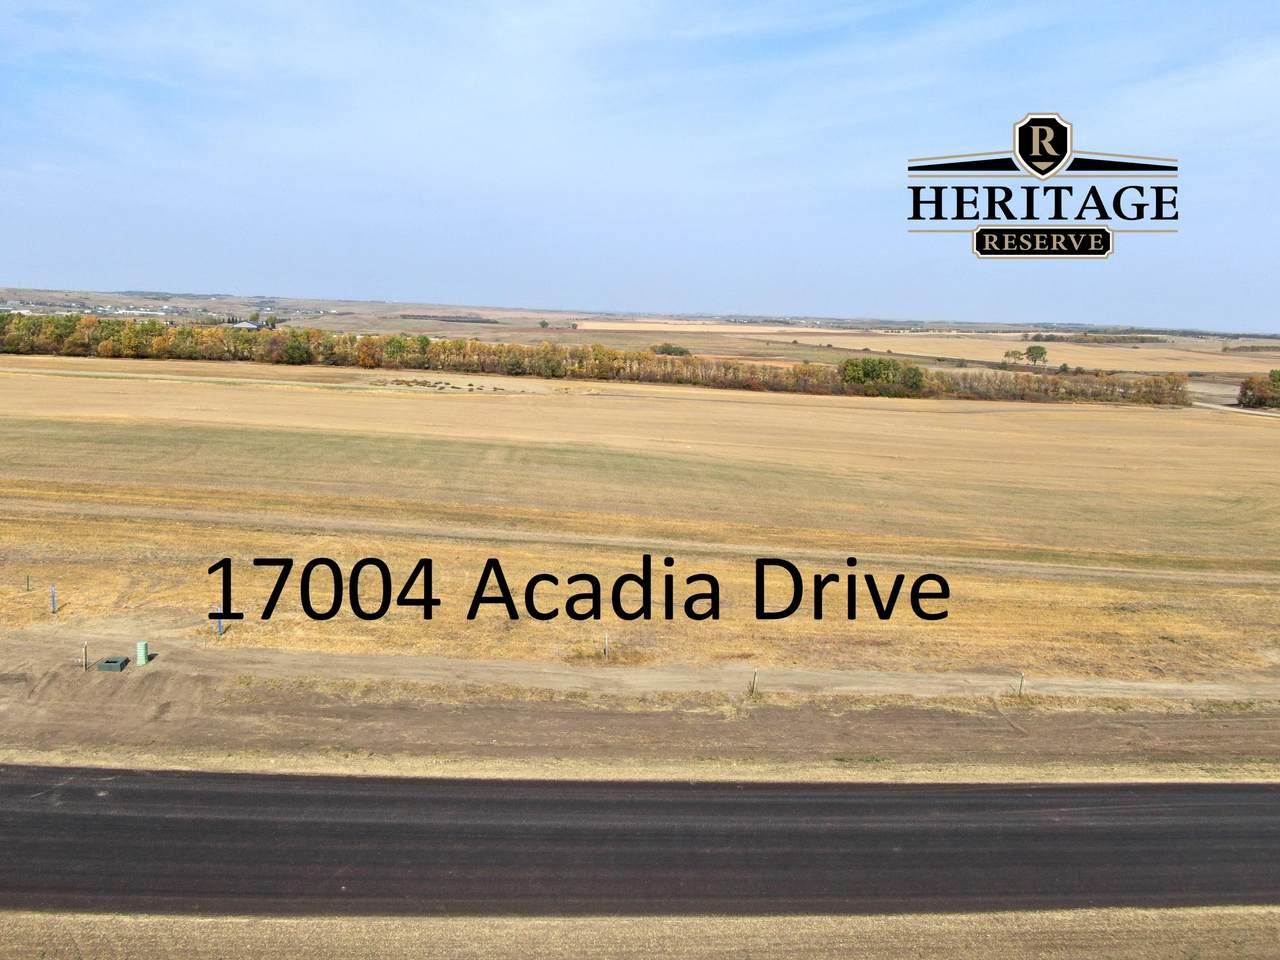 17004 Acadia Drive - Photo 1